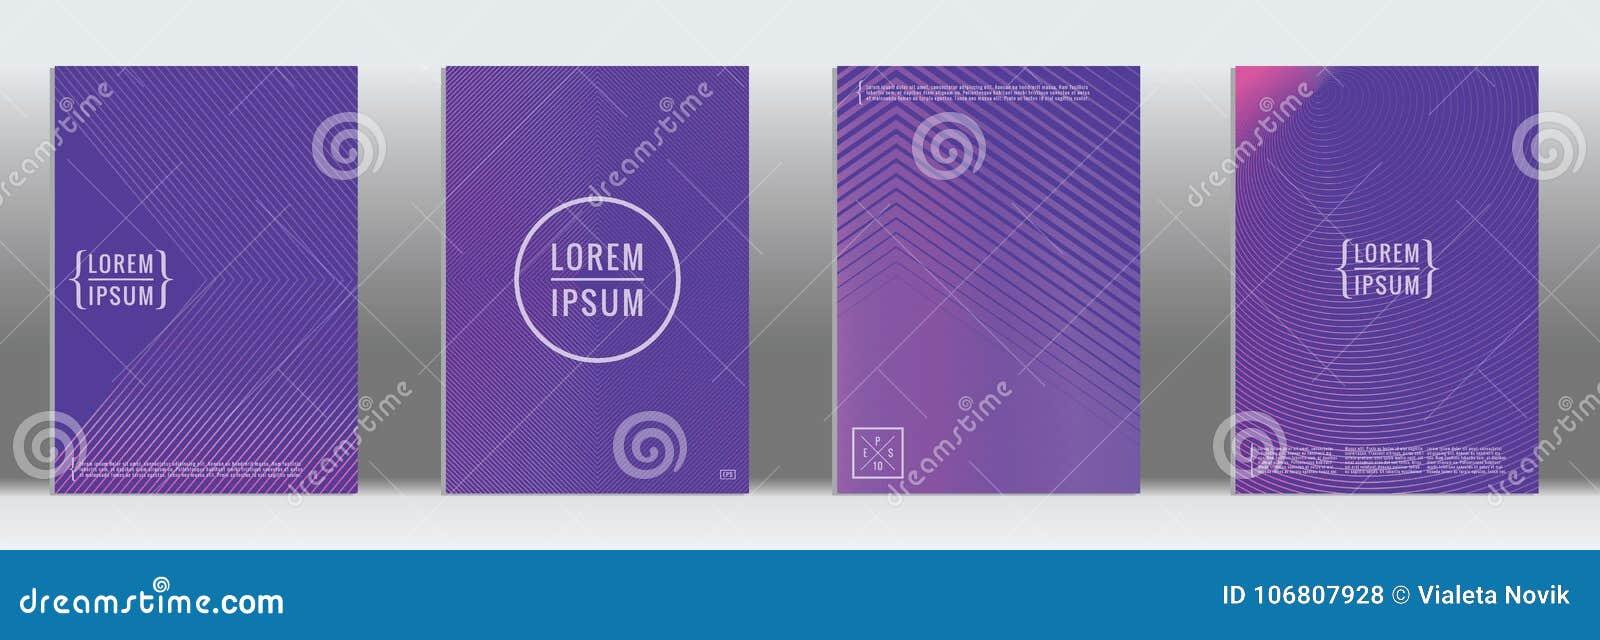 Vector geometric line pattern for poster design.